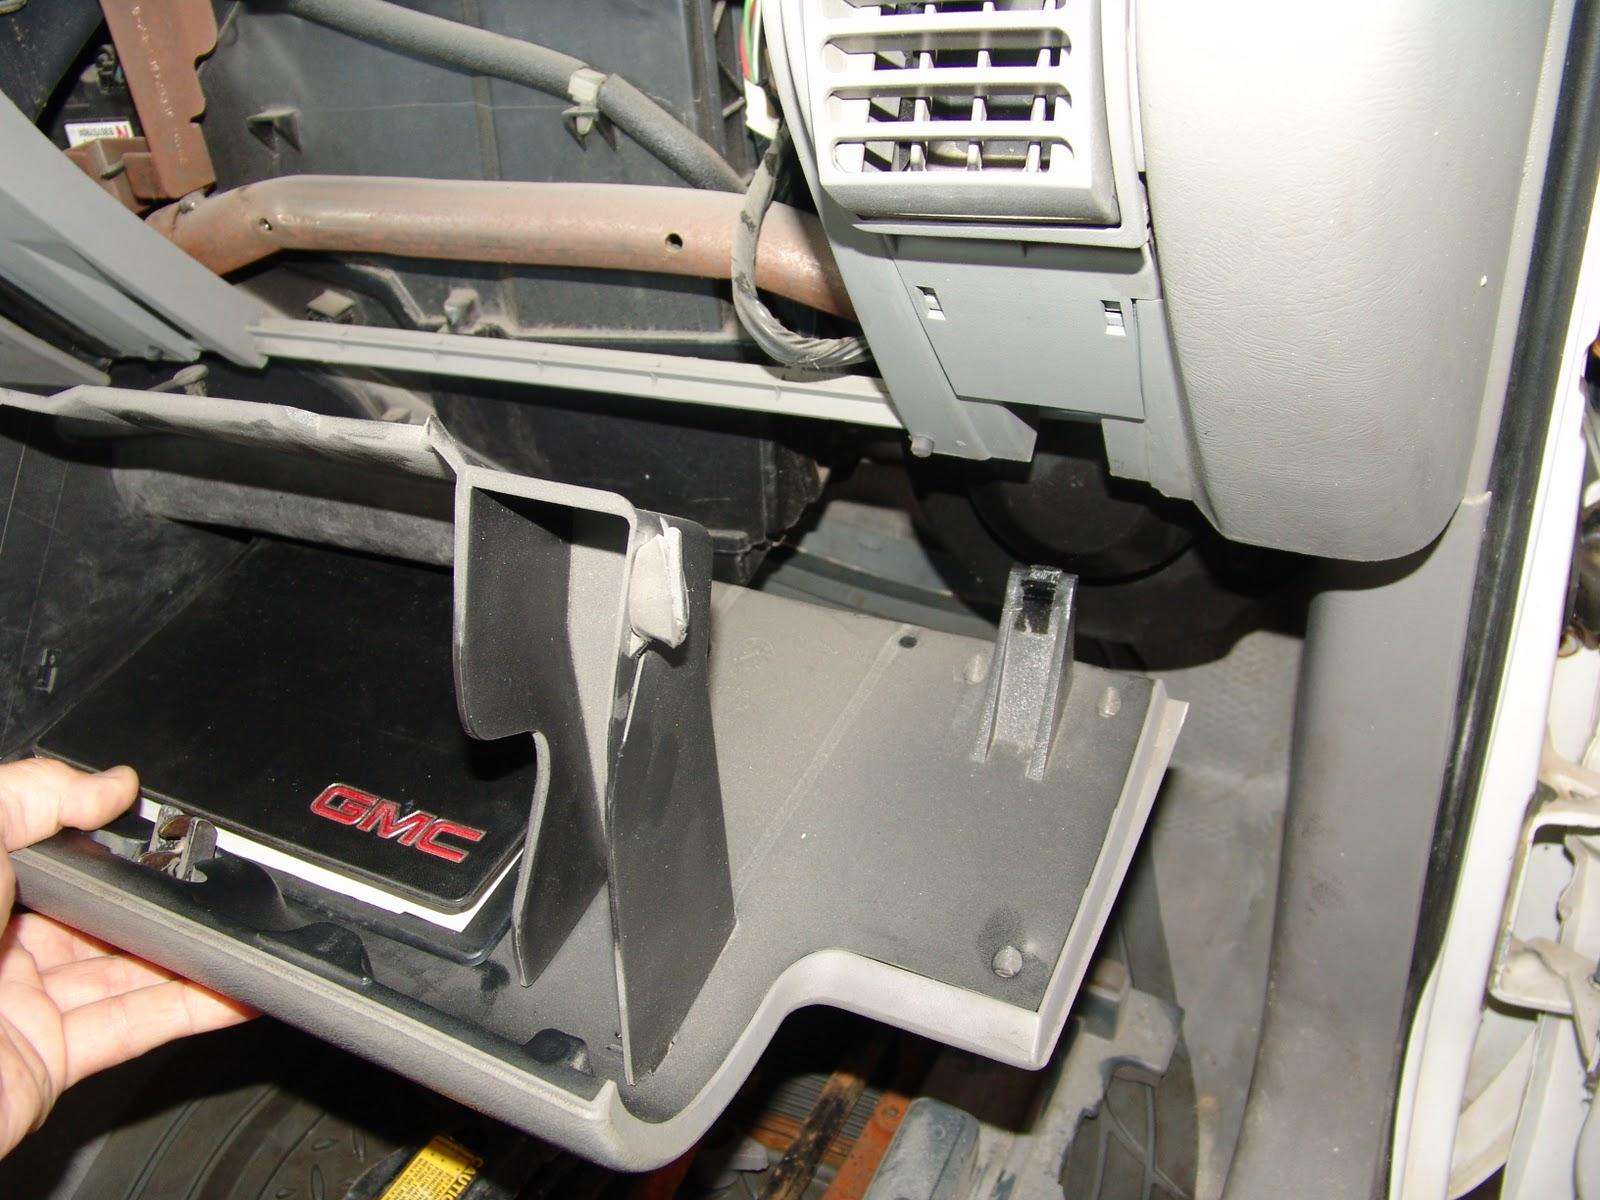 1997 Gmc C1500 Pickup  No Blower Part 2